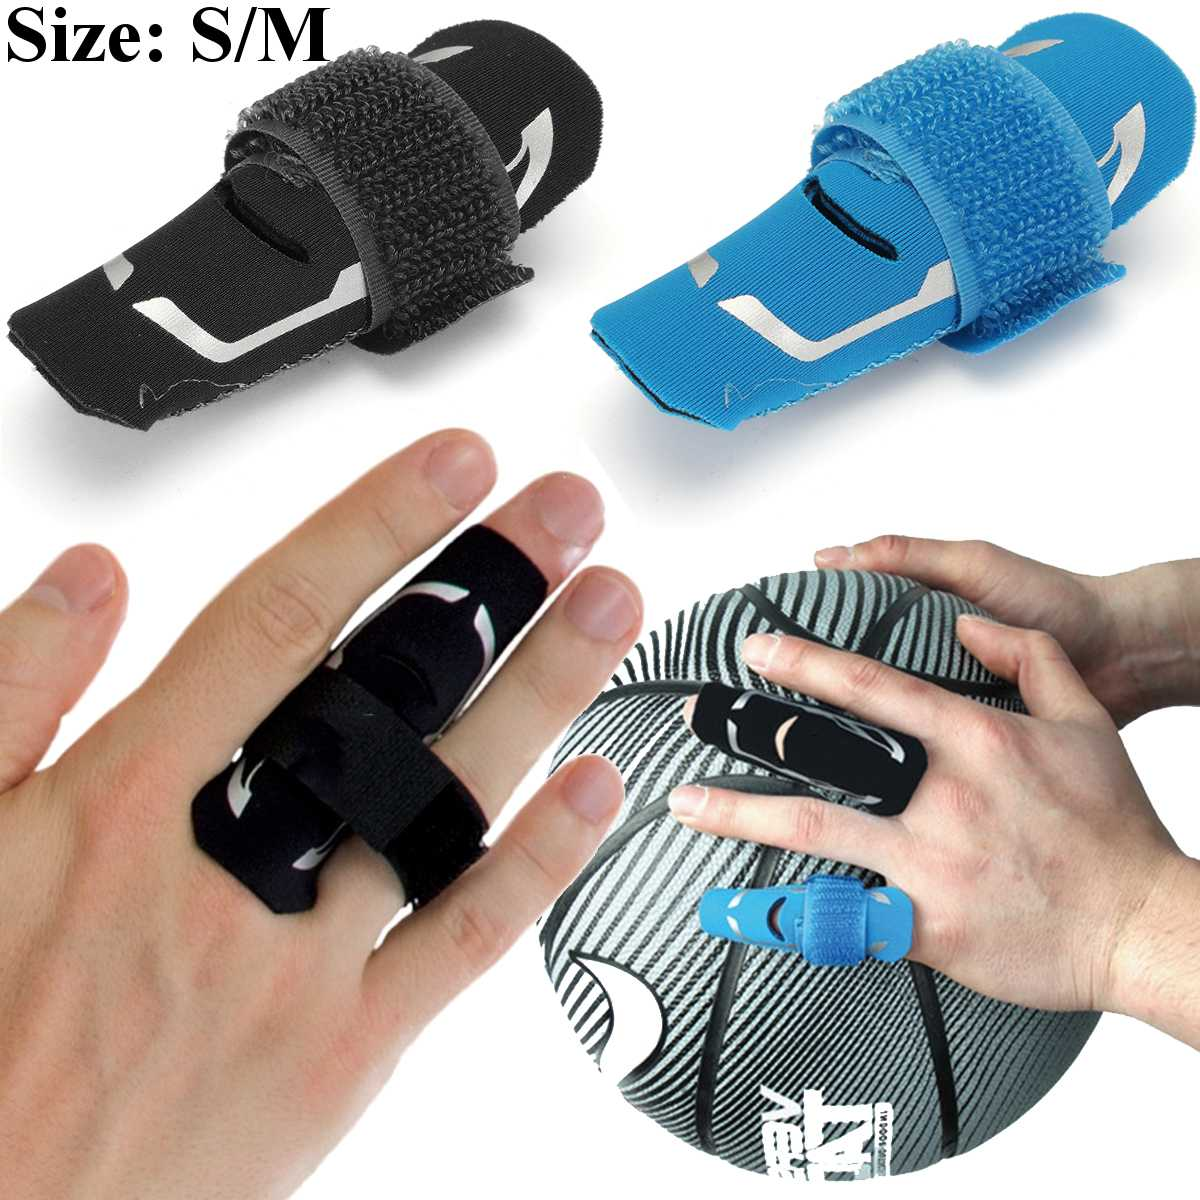 New Basketball Finger Protect Brace Sport Finger Arthrosis Band Protect Splint Guard Bands Finger Protector Guard